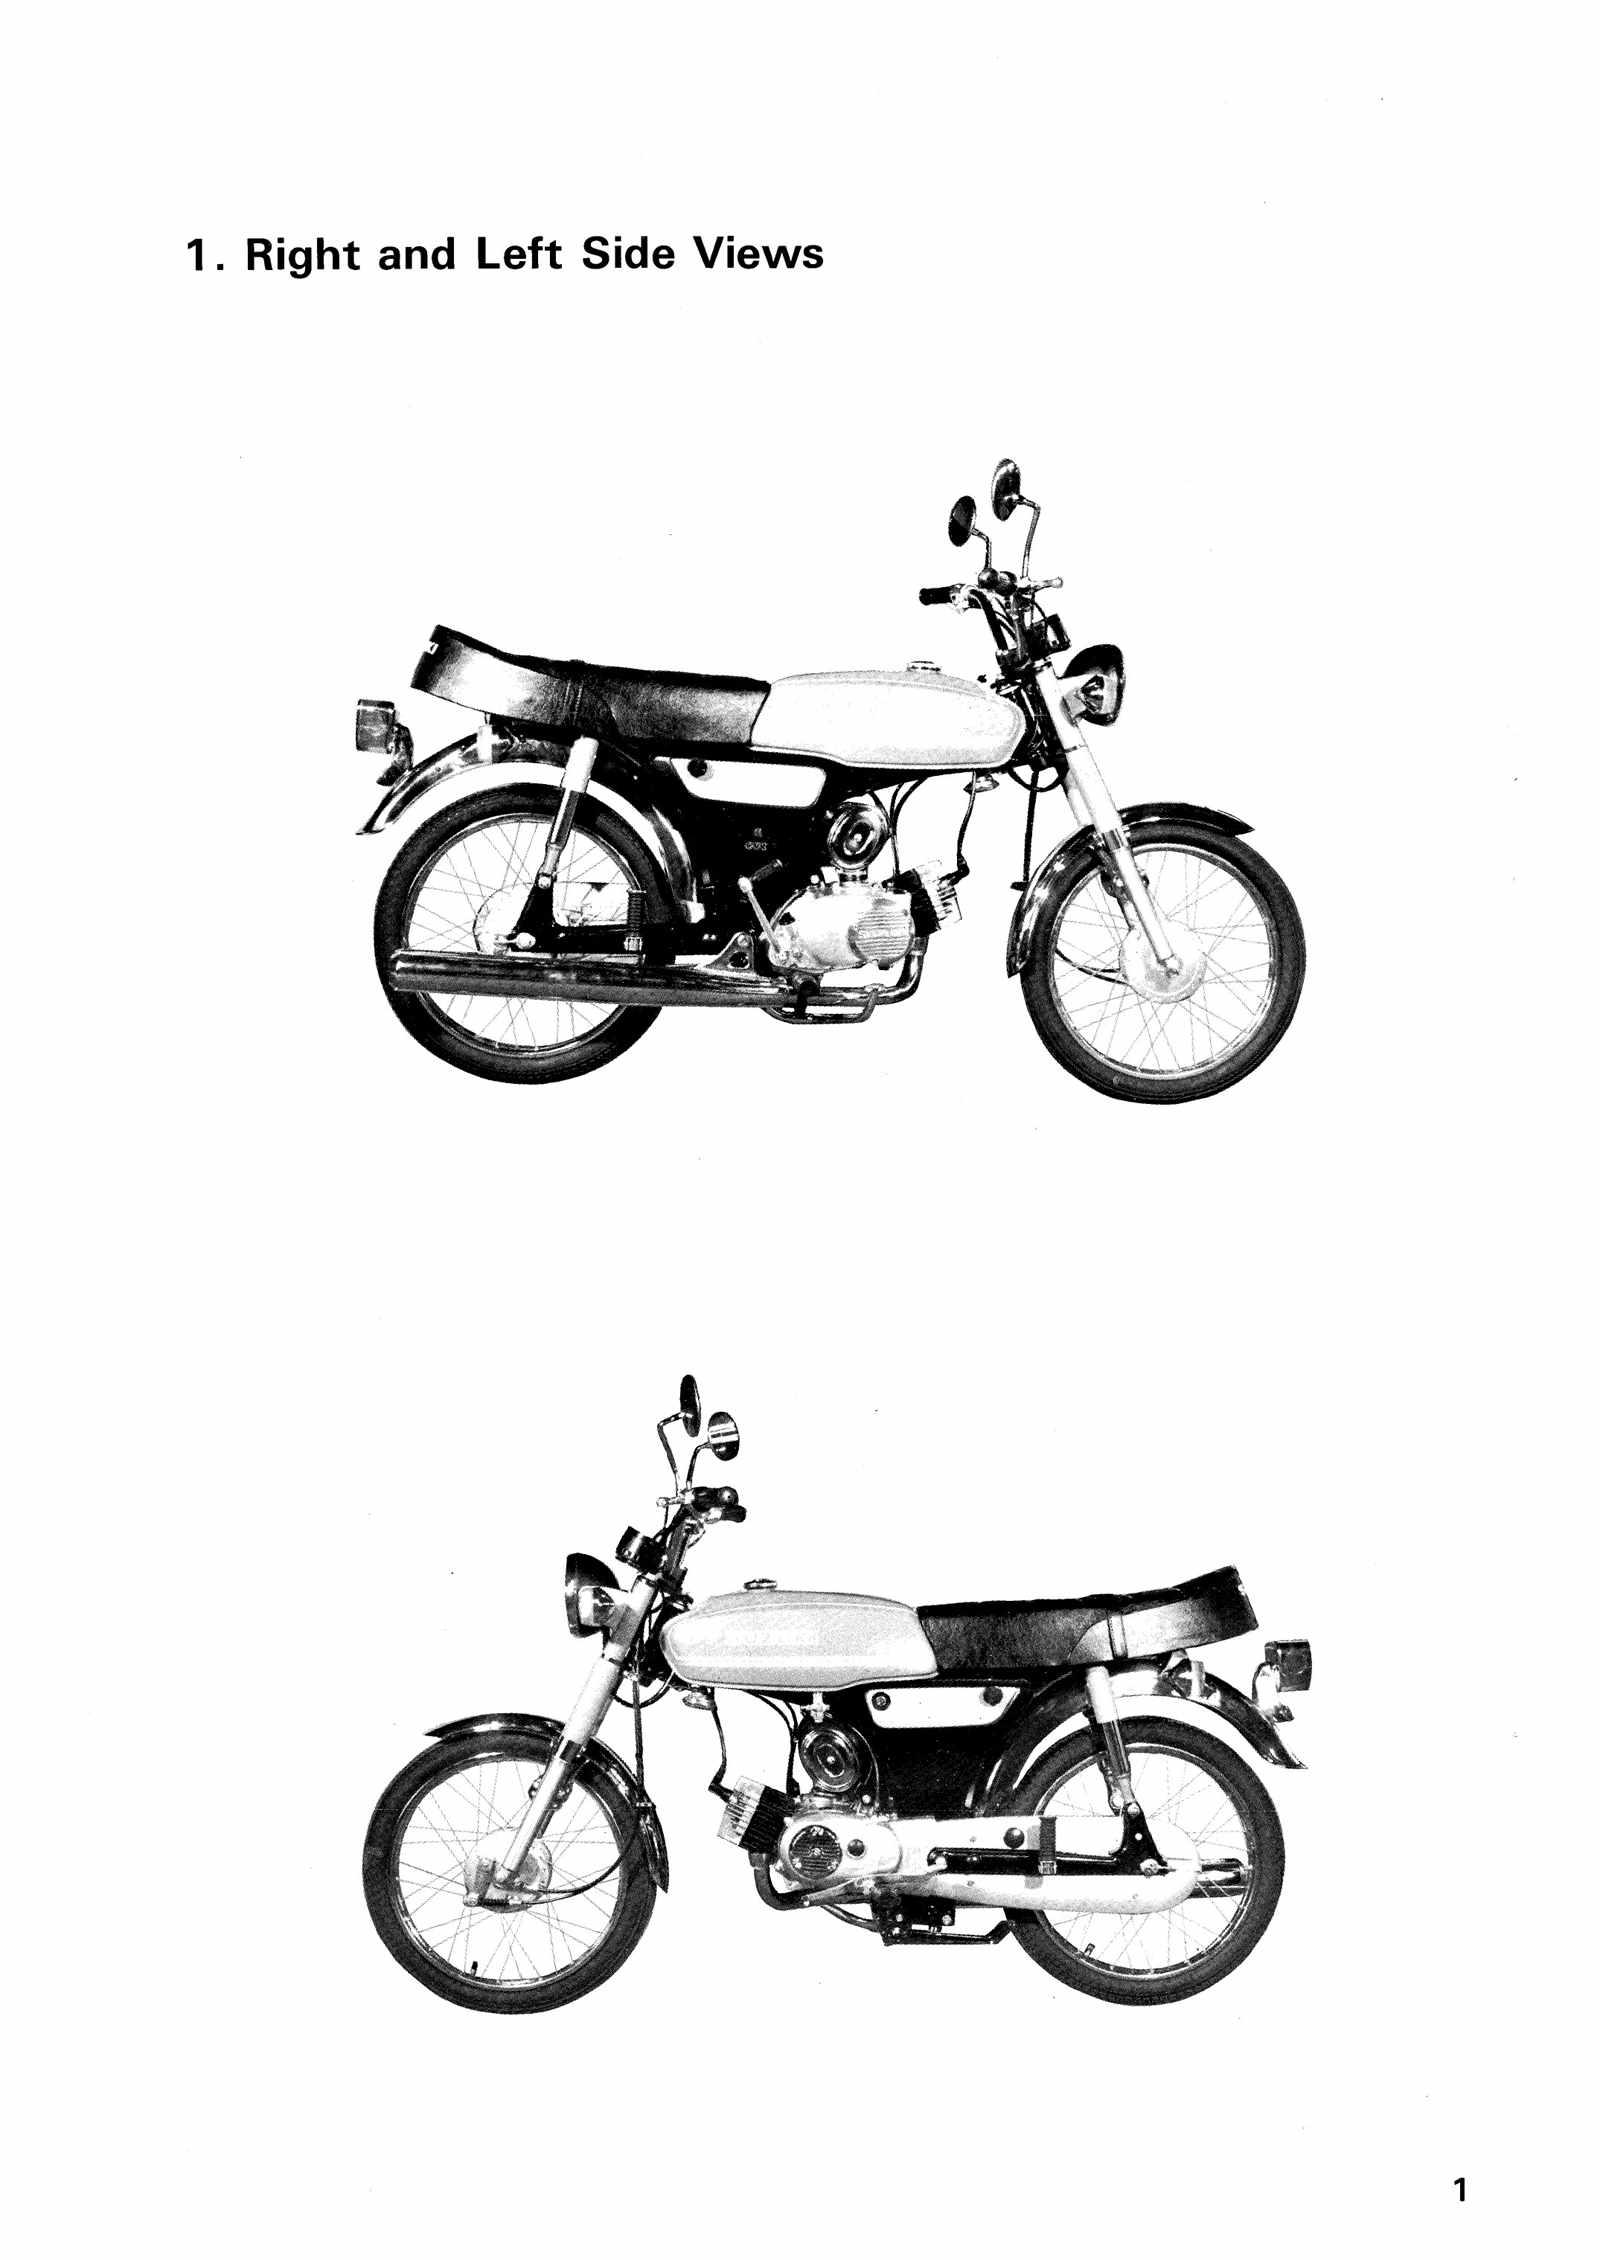 Suzuki A50 AS50 69-81 Service Manual Free Download